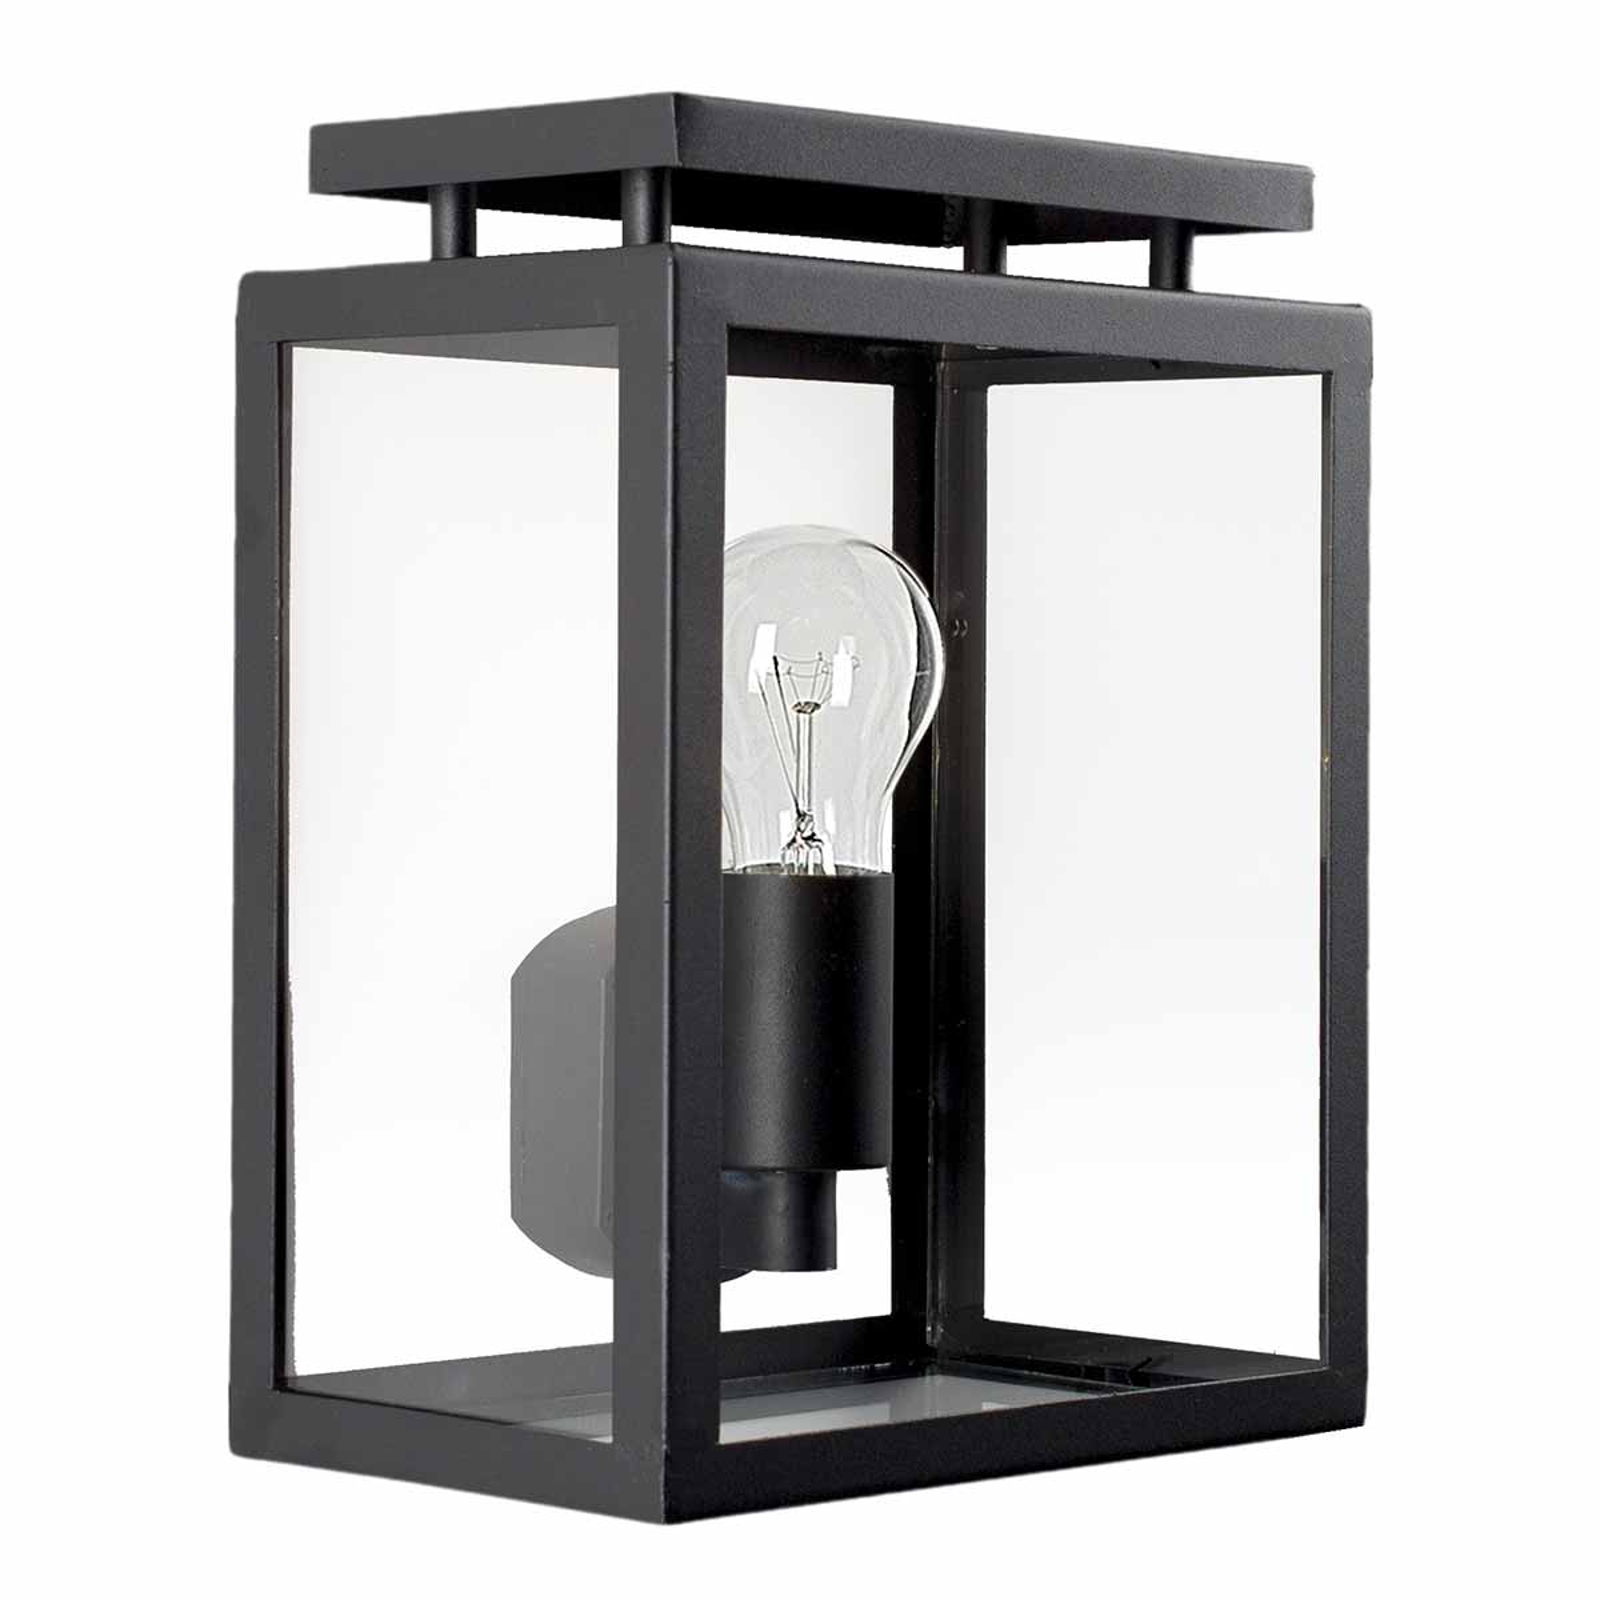 Buitenwandlamp DE Vecht, 28 cm, zwart